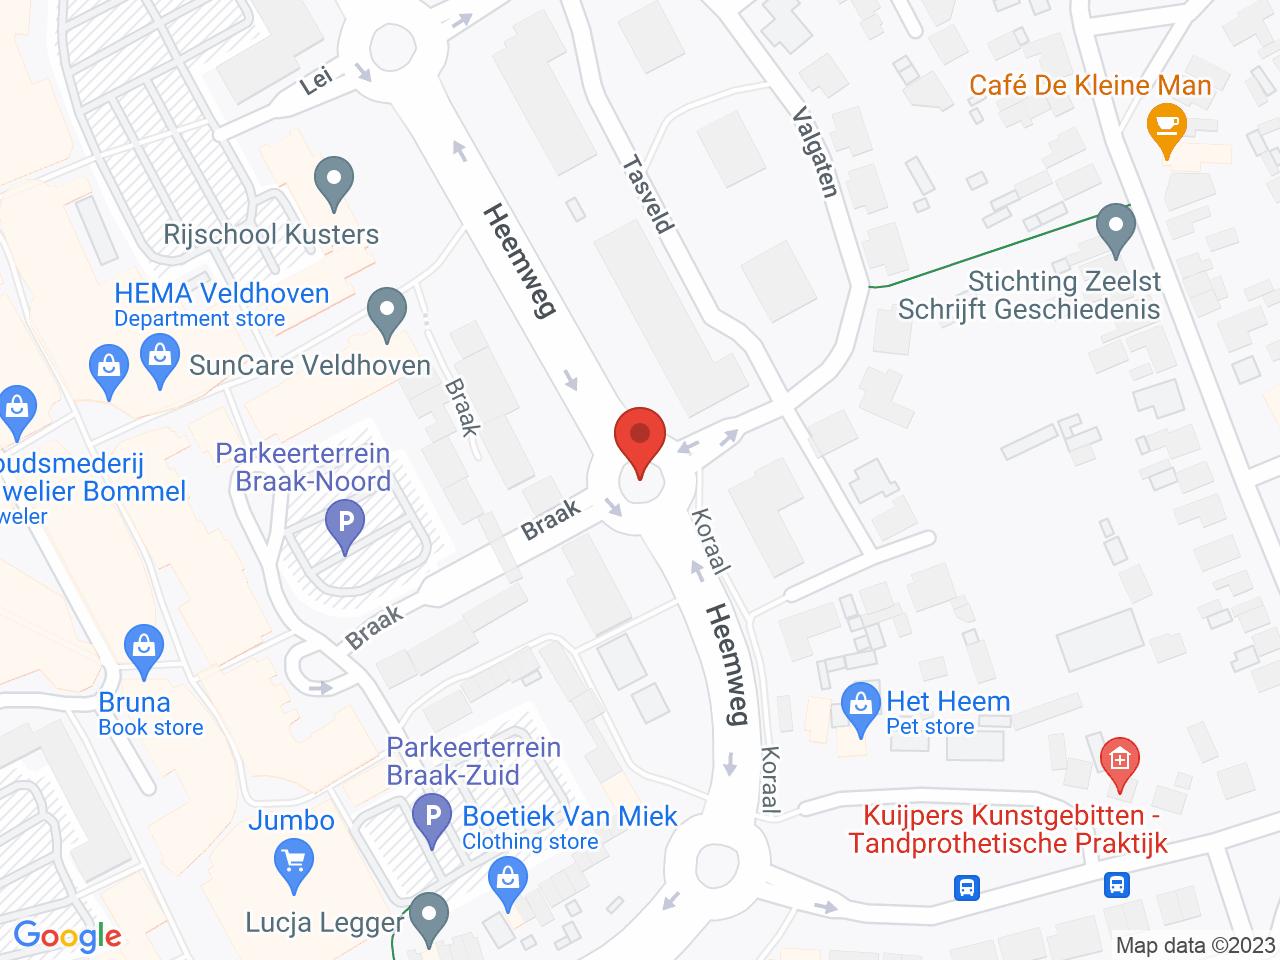 Rotonde Heemweg - Tasveld 2 op een kaart getoond.